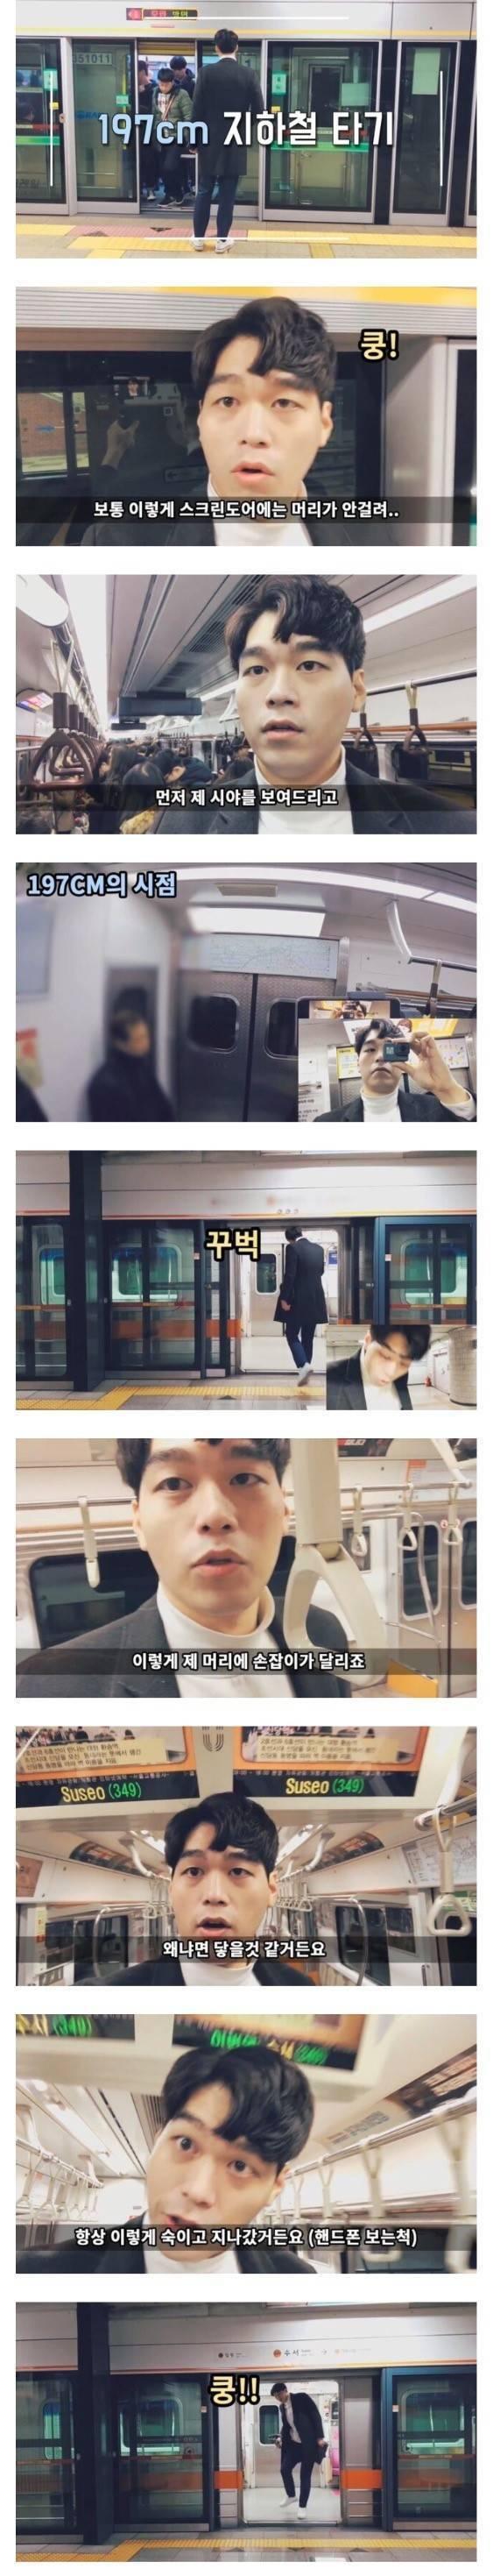 197cm의 지하철 타기.jpg | 인스티즈